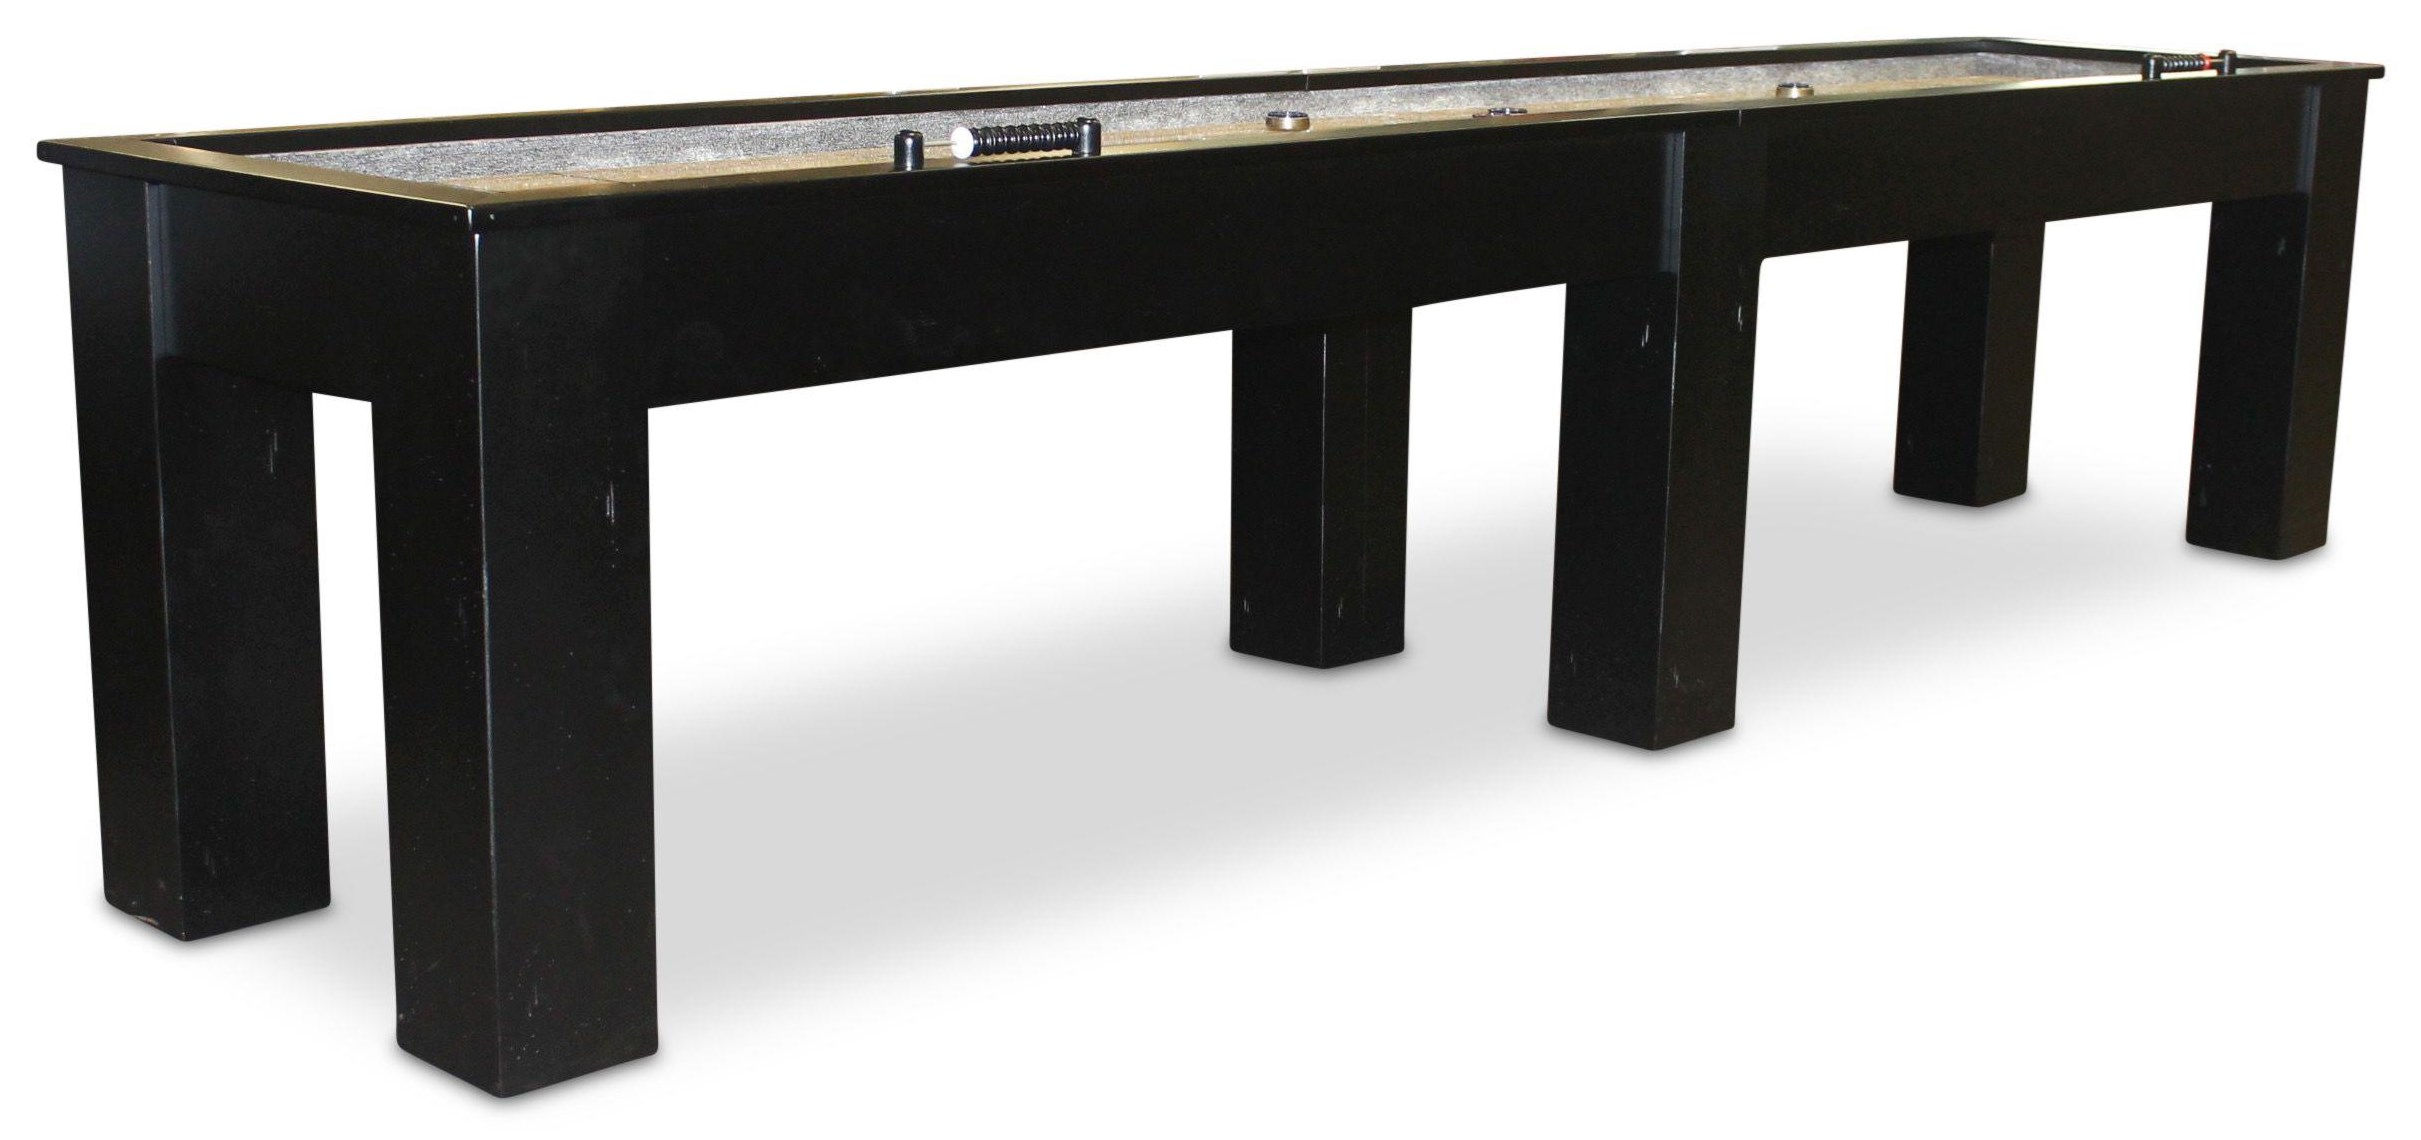 Fulton 12' Shuffleboard by Plank & Hide at Johnny Janosik